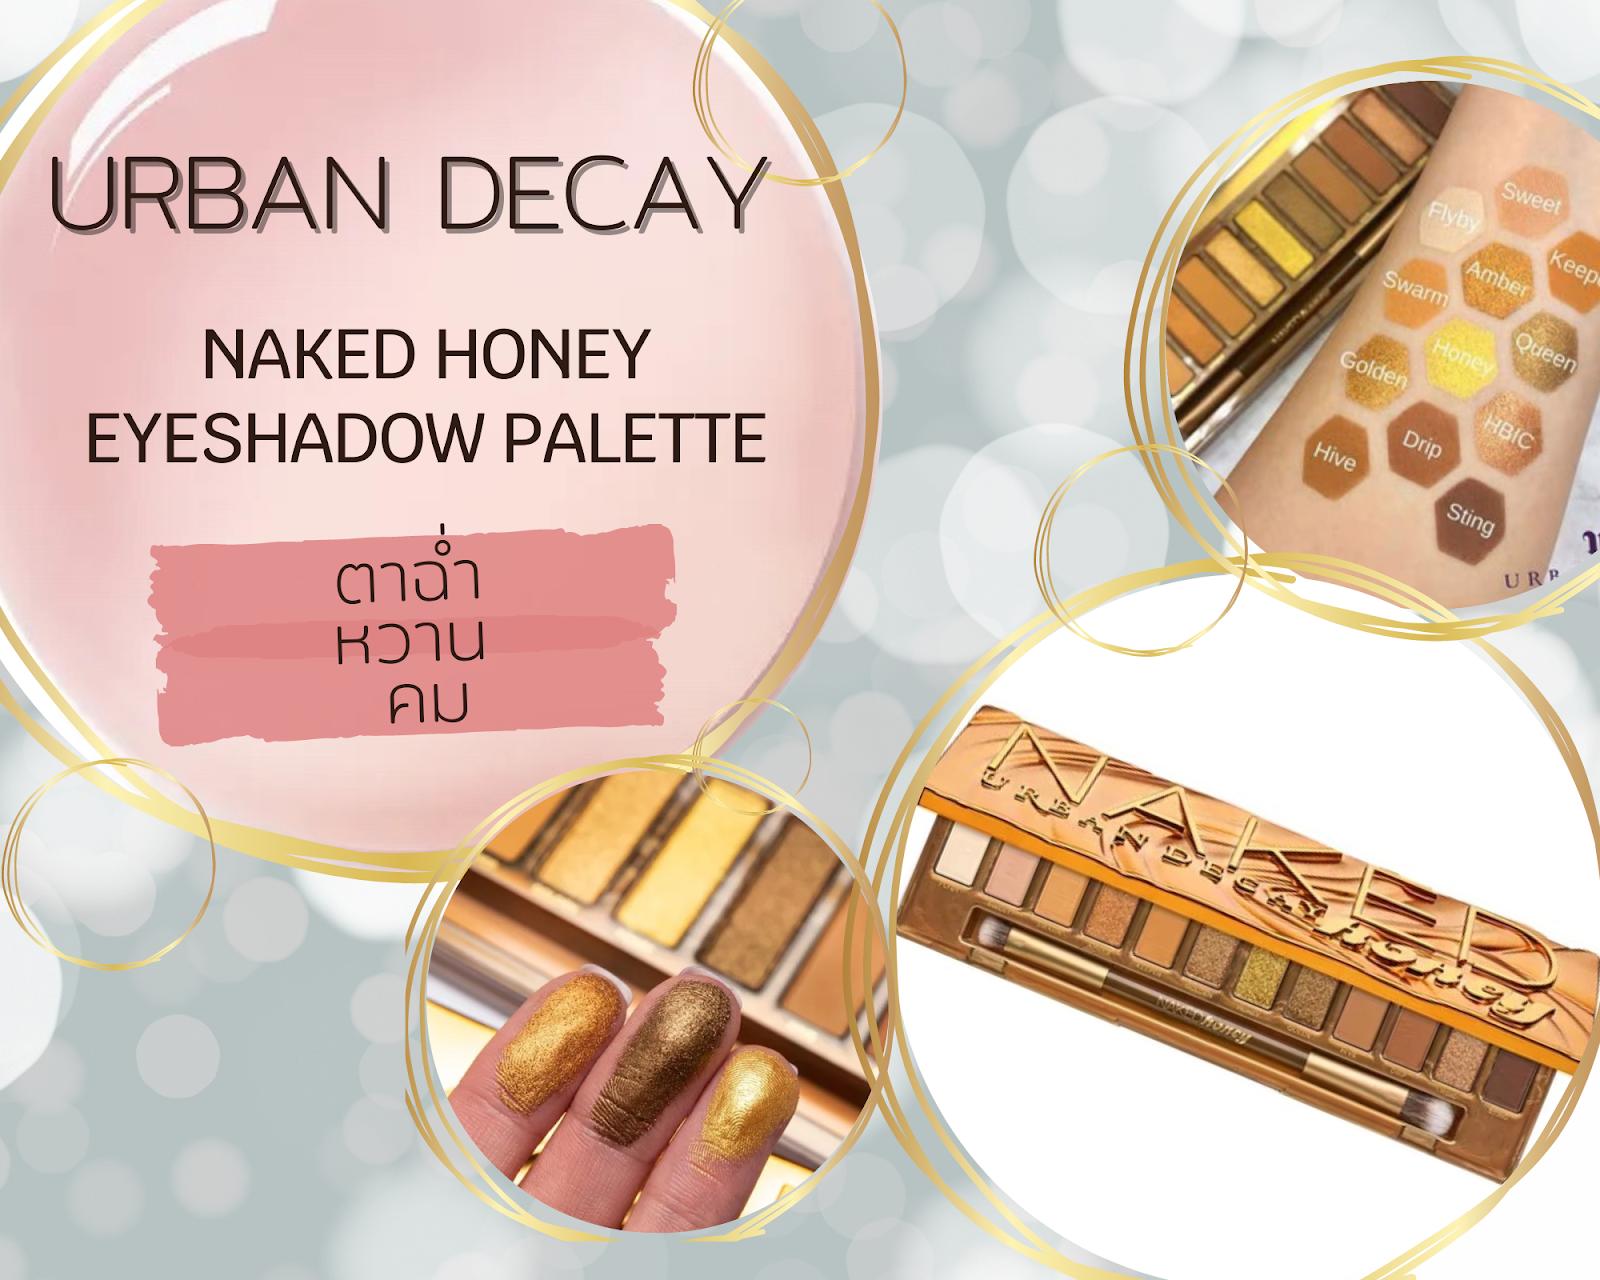 5. URBAN DECAY Naked Honey Eyeshadow Palette